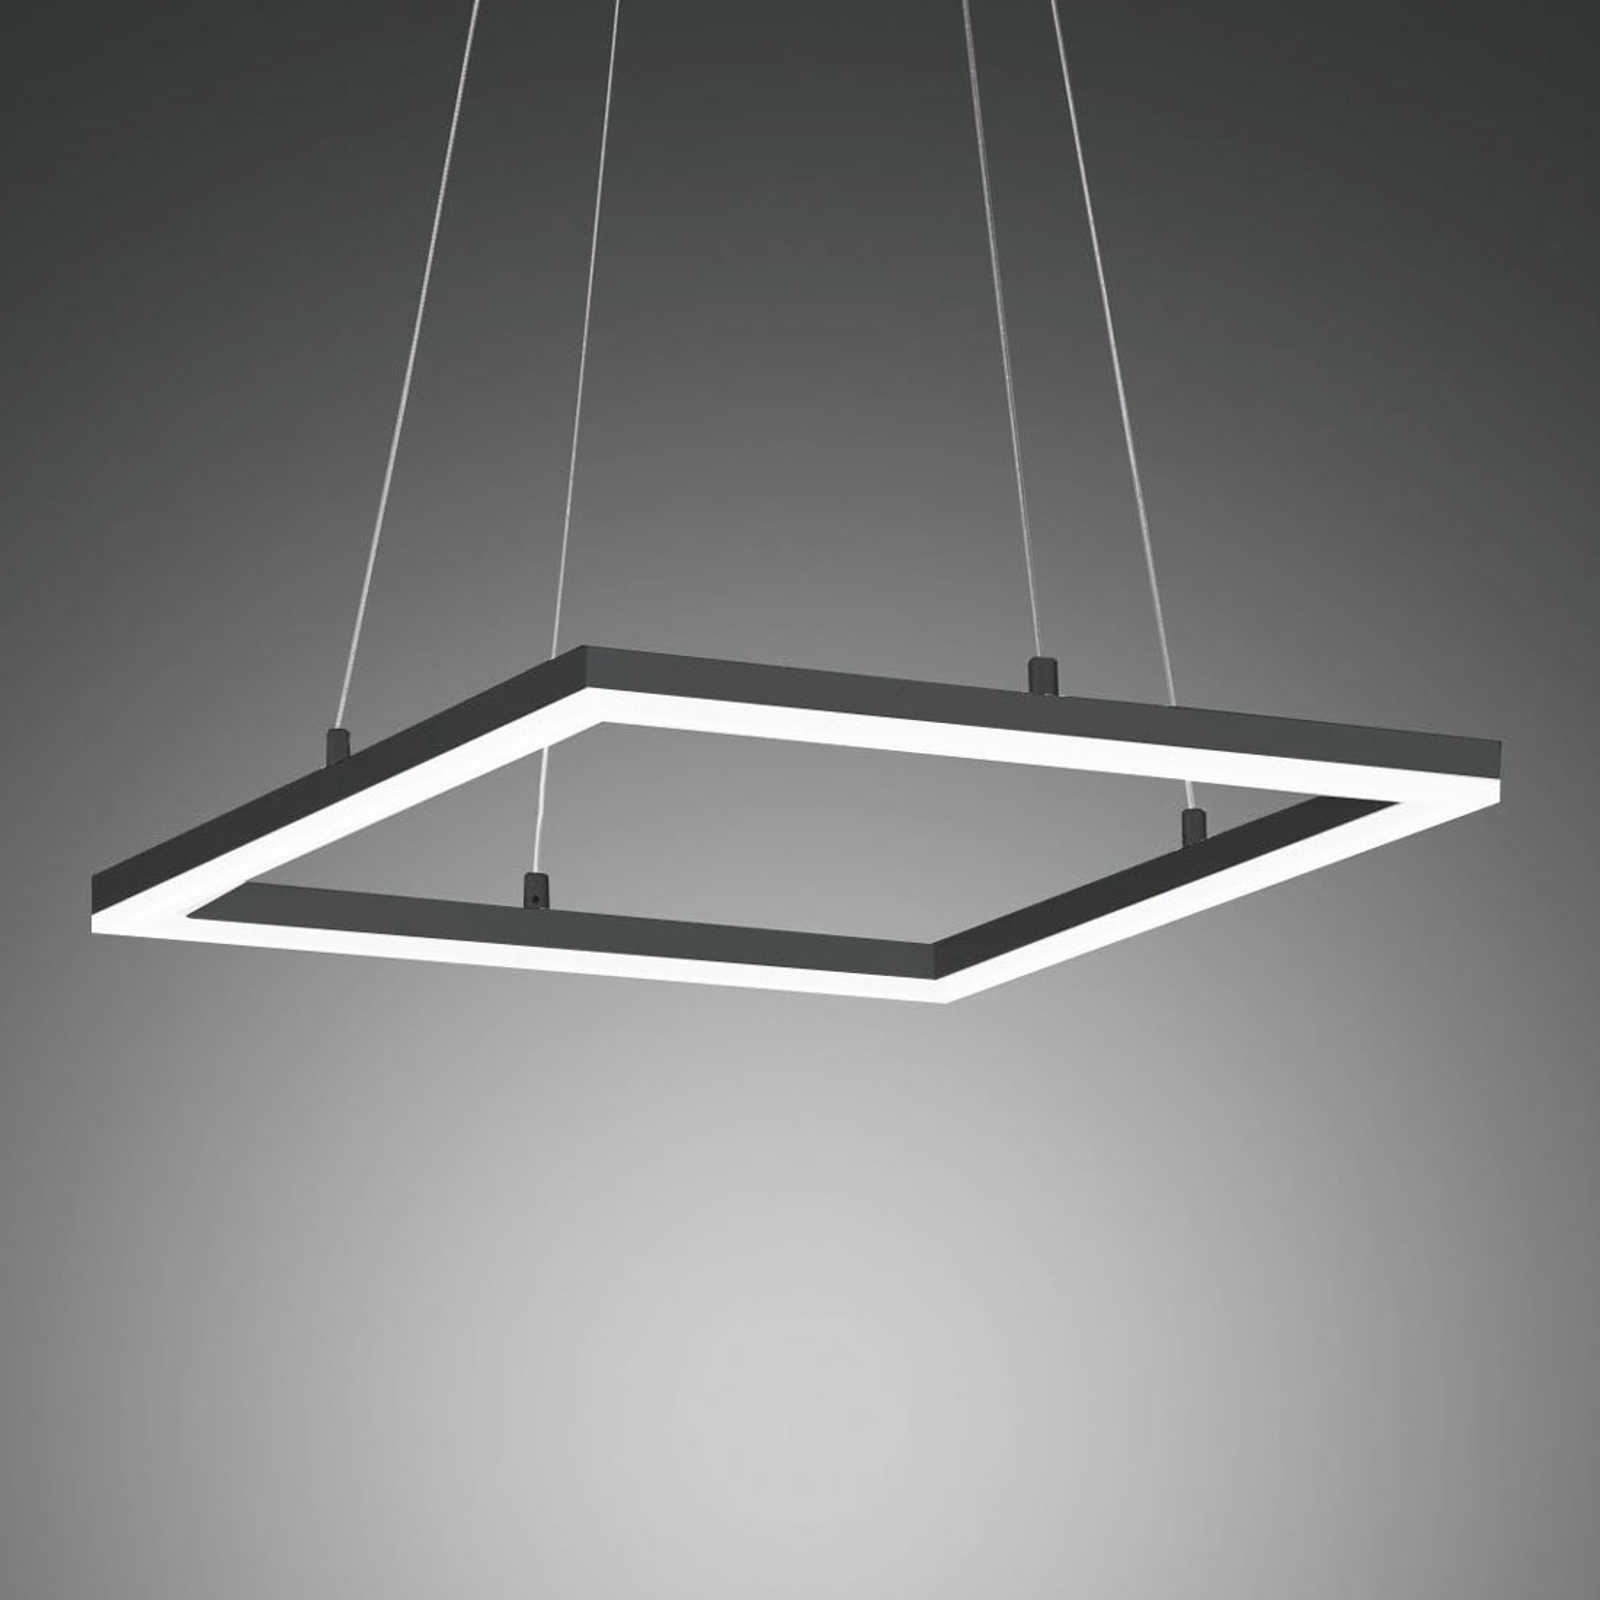 LED-Pendelleuchte Bard 42x42 cm, anthrazit